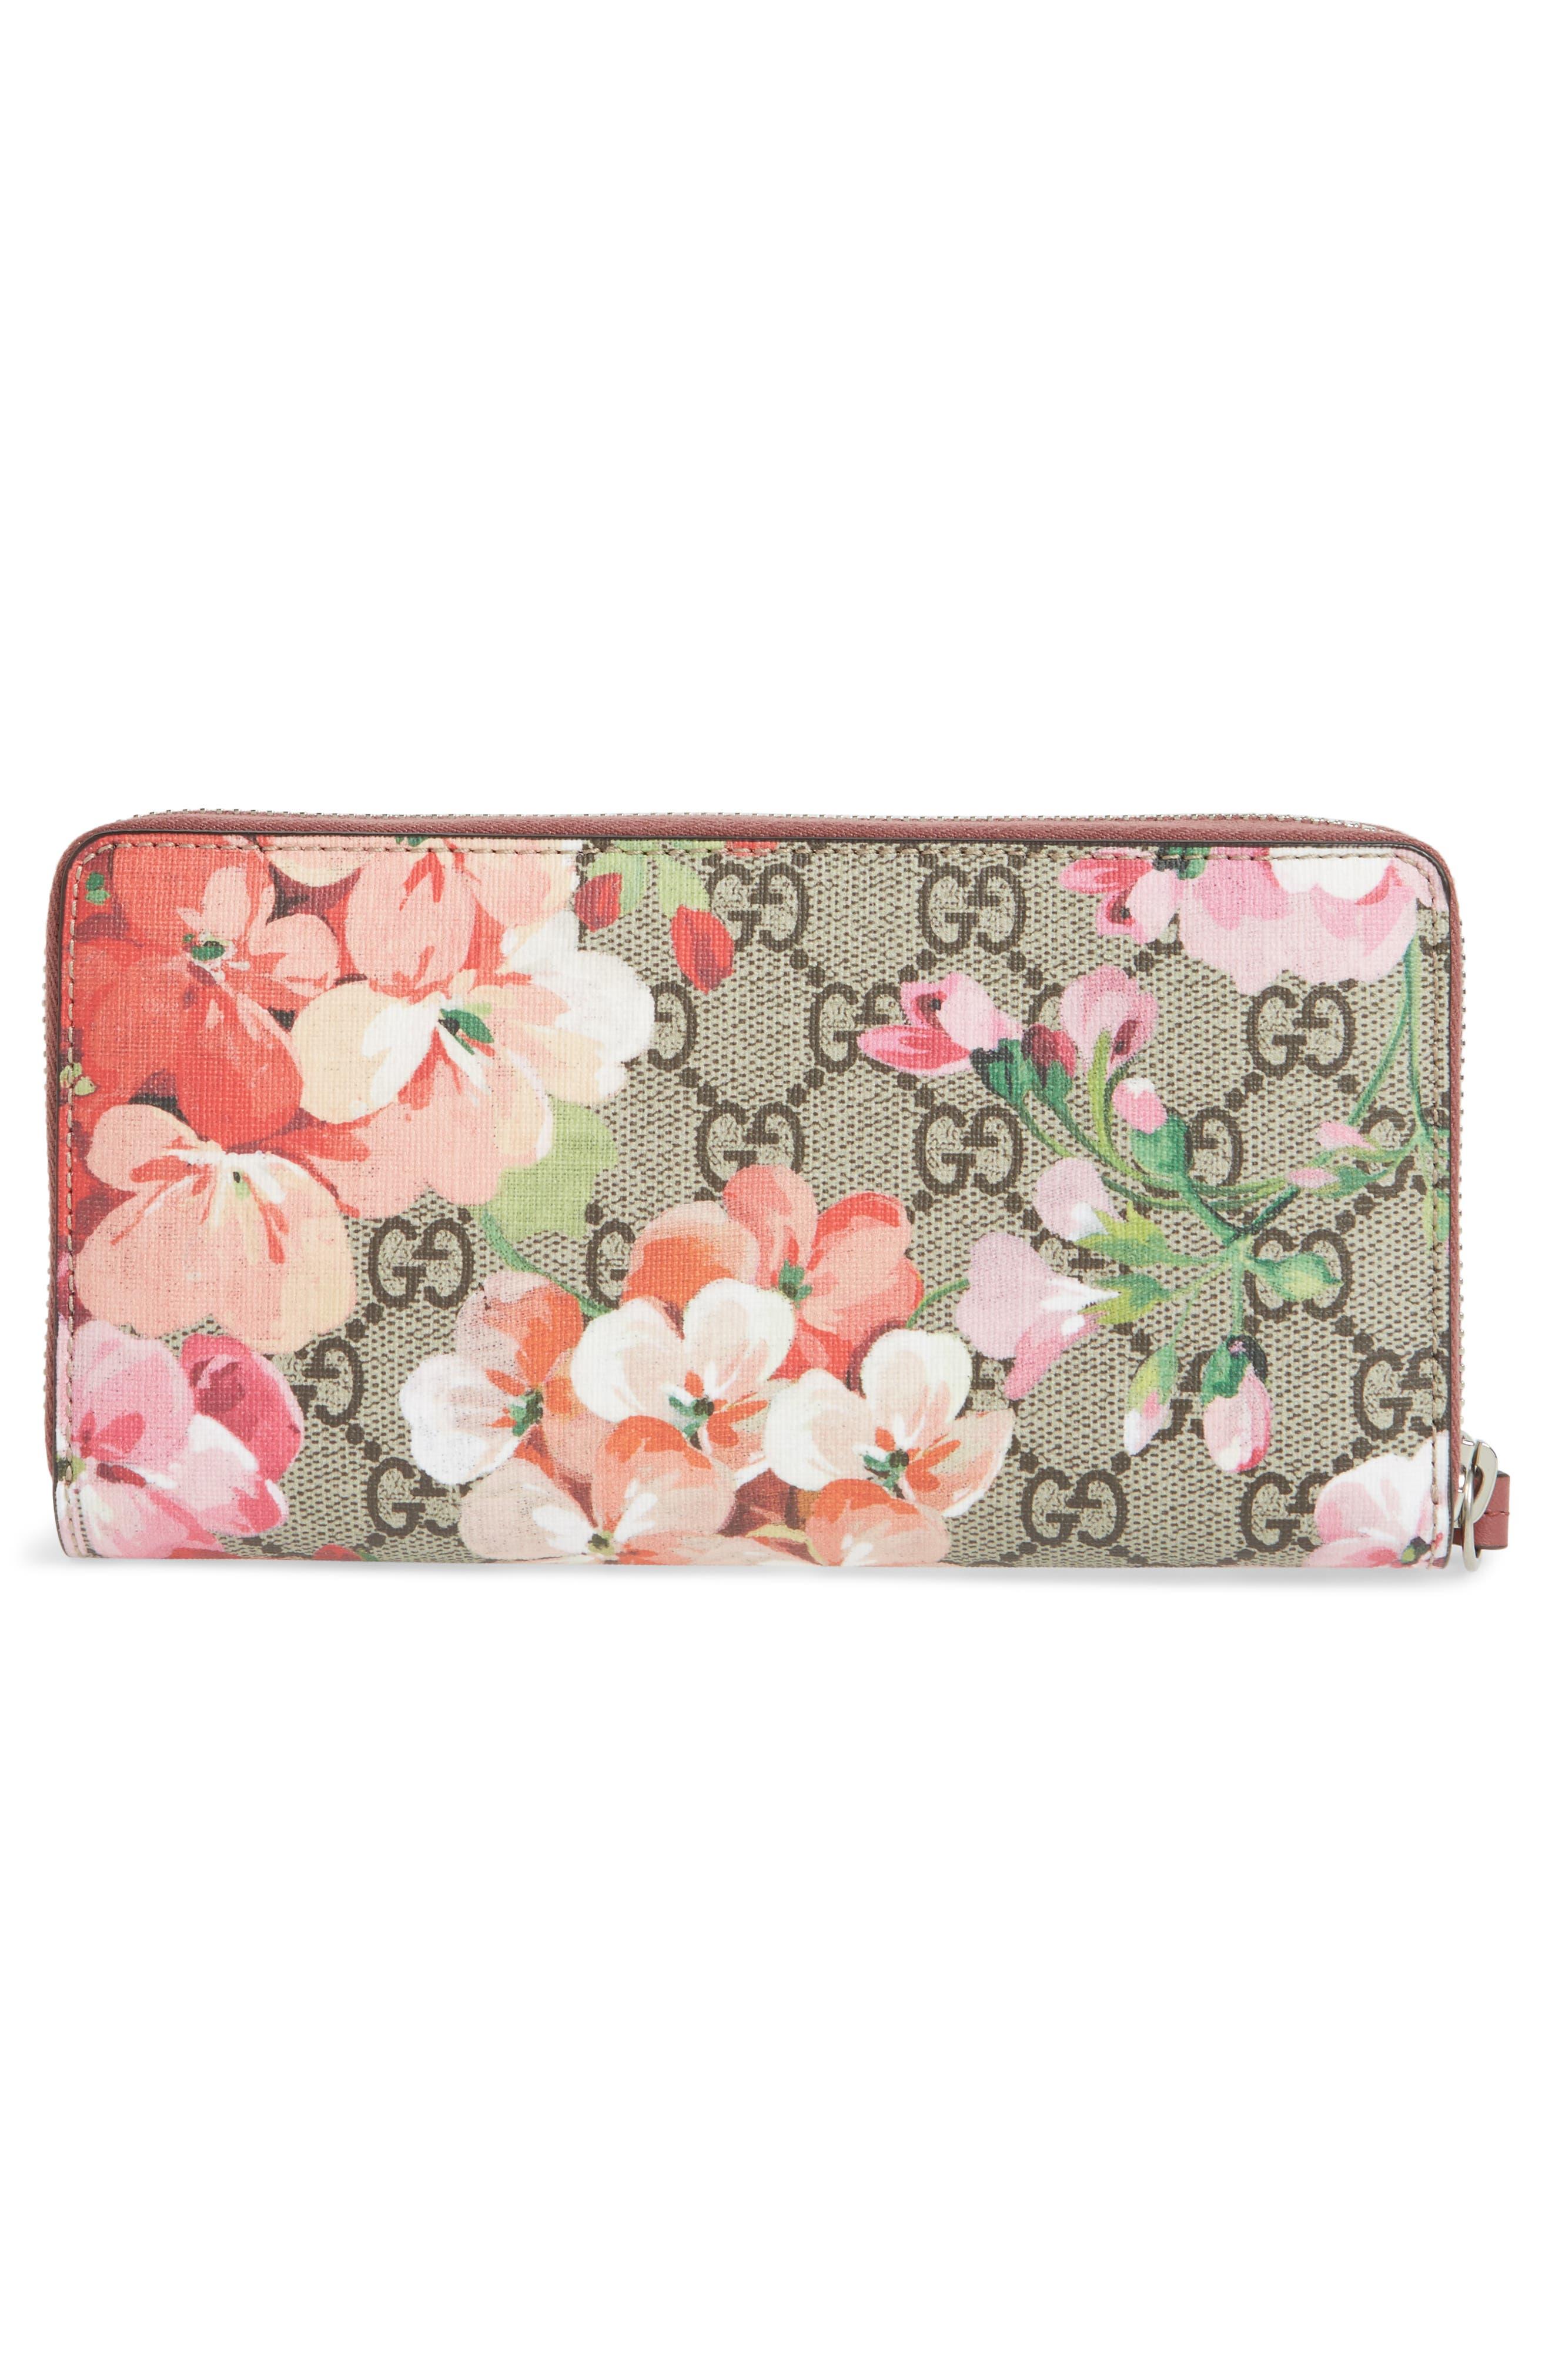 GG Blooms Zip Around Wallet,                             Alternate thumbnail 4, color,                             Beige Ebony Multi/ Dry Rose